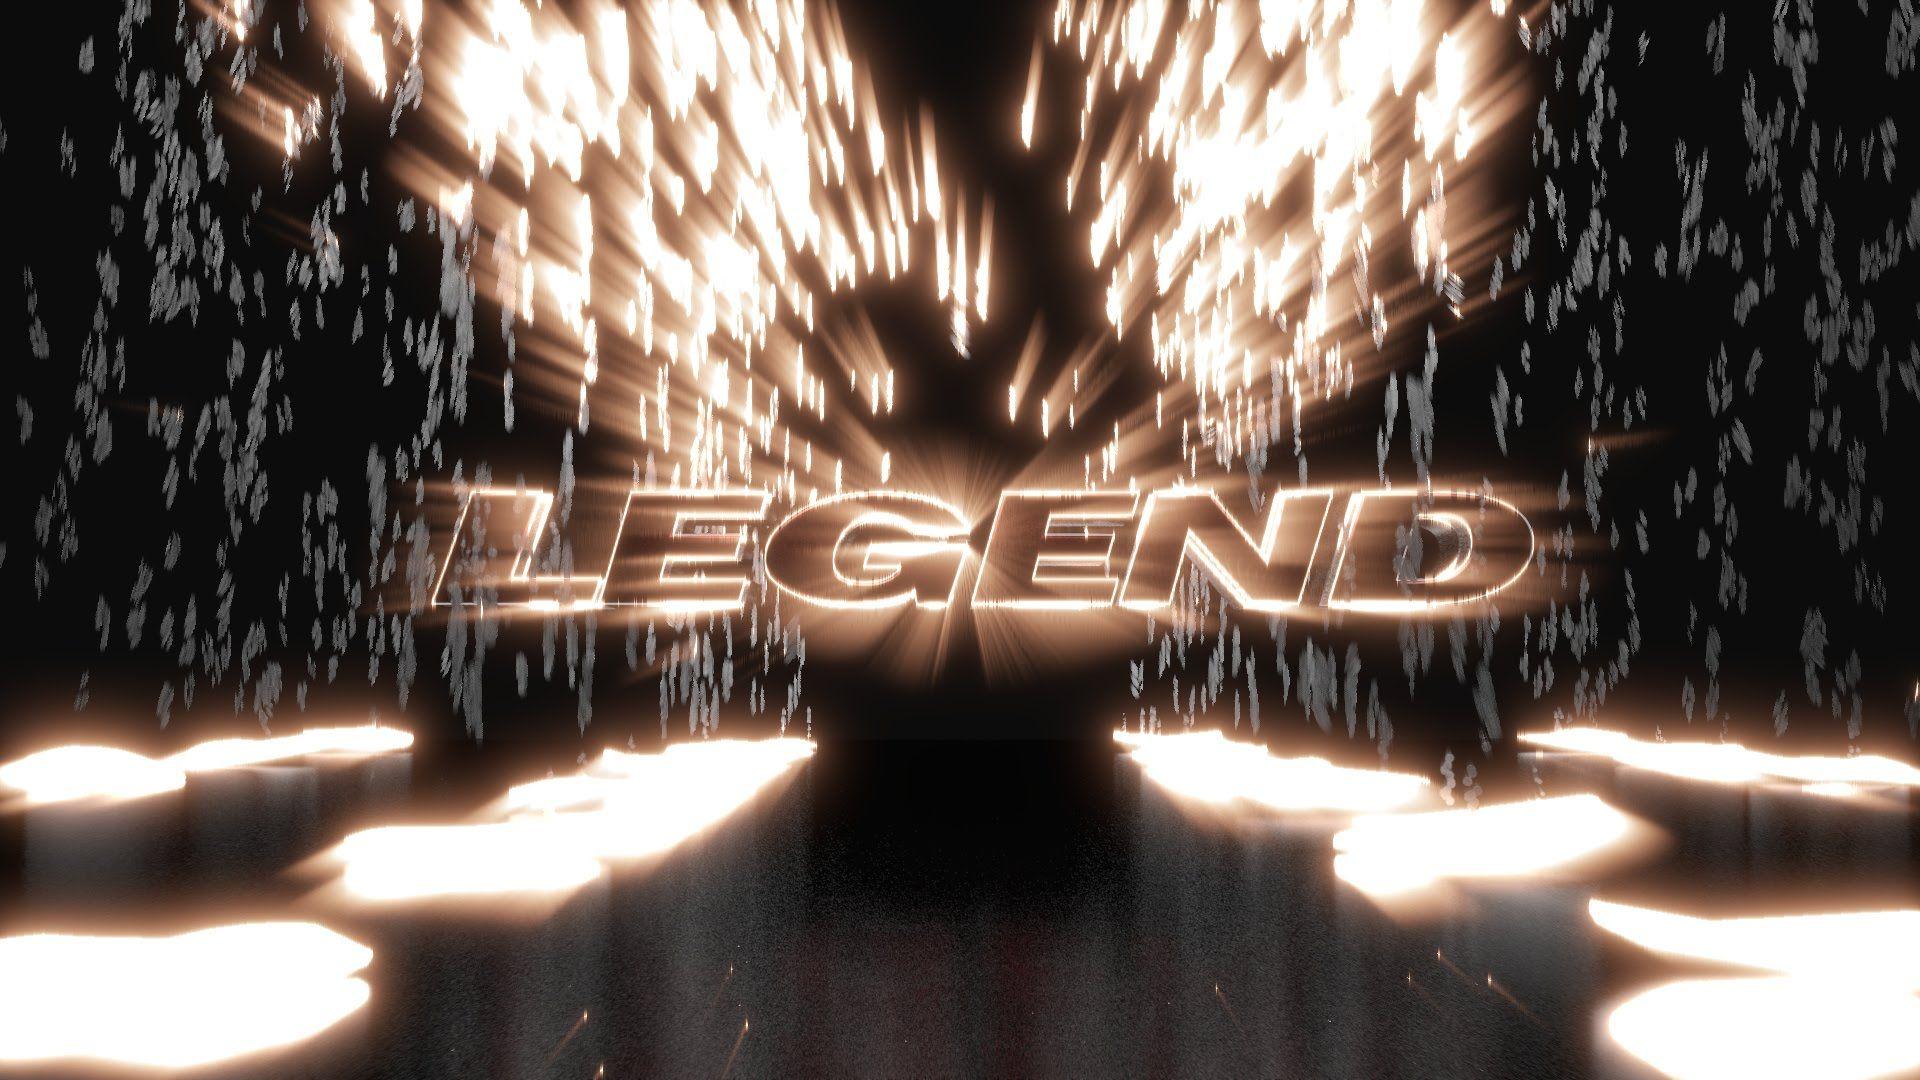 FREE Blender intro template Legend BLENDER INTRO TEMPLATE WEEK 3